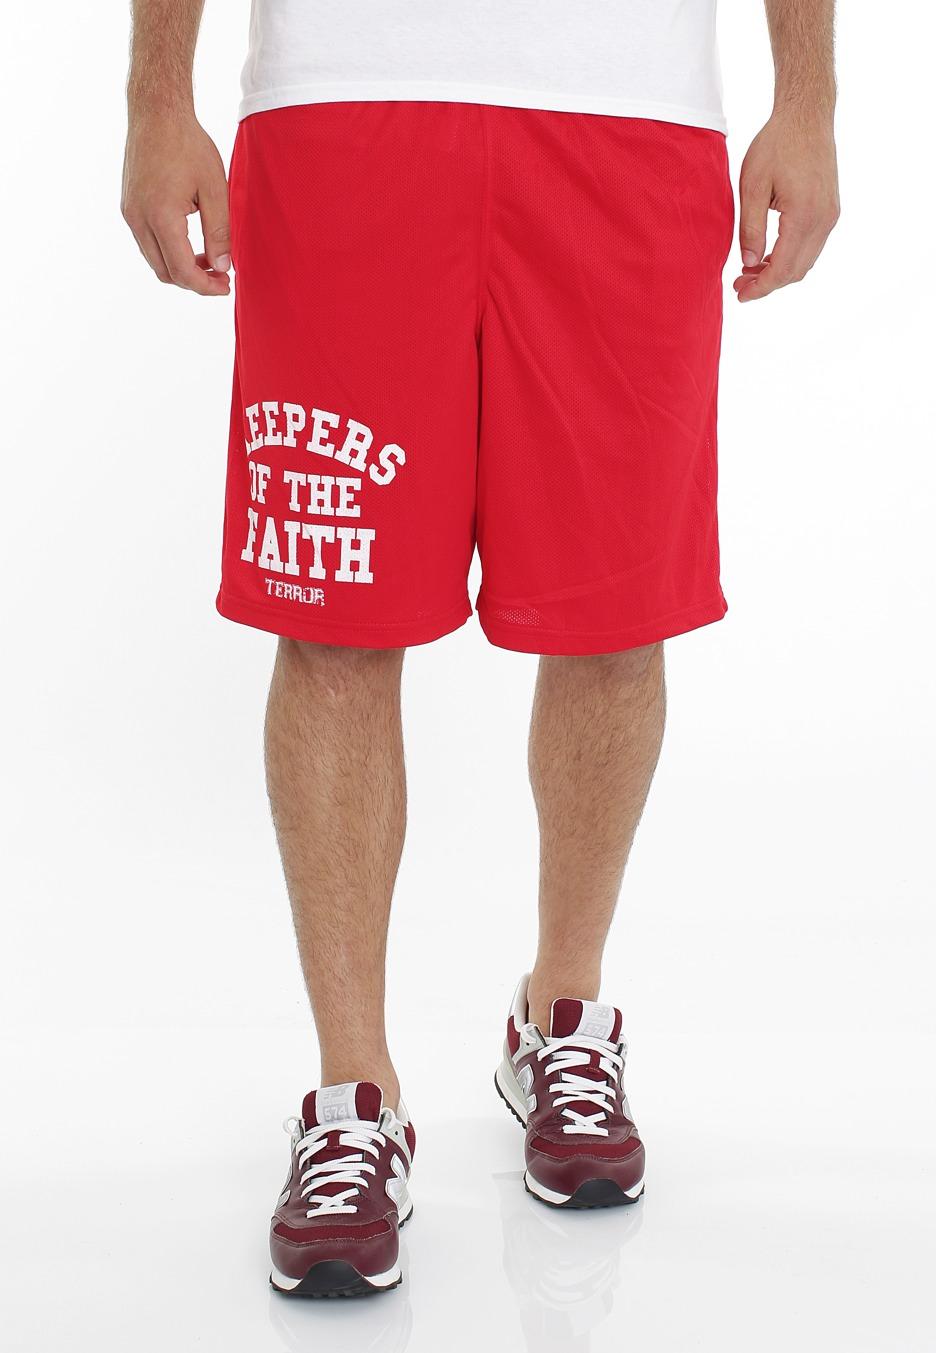 Terror - KOTF Logo Red - Shorts - Impericon.com Worldwide